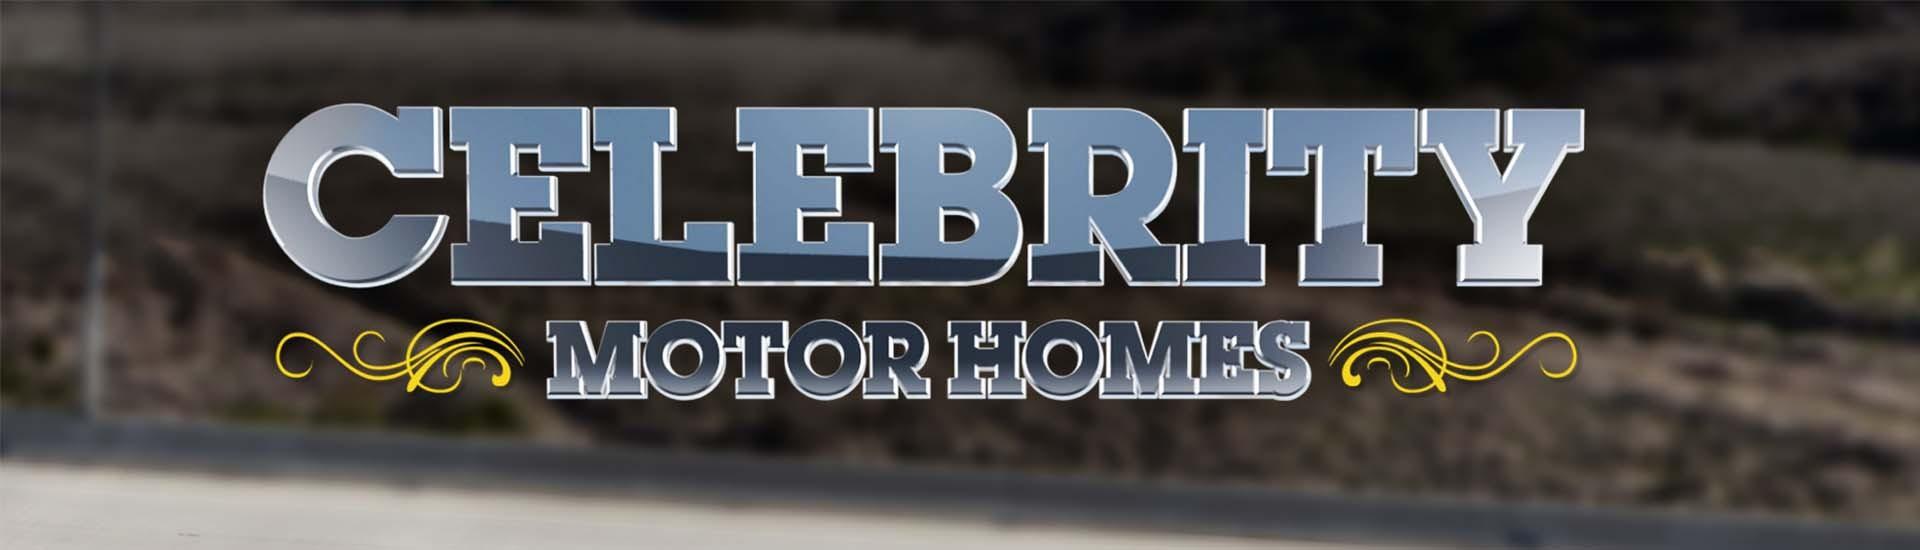 celebrity motorhomes